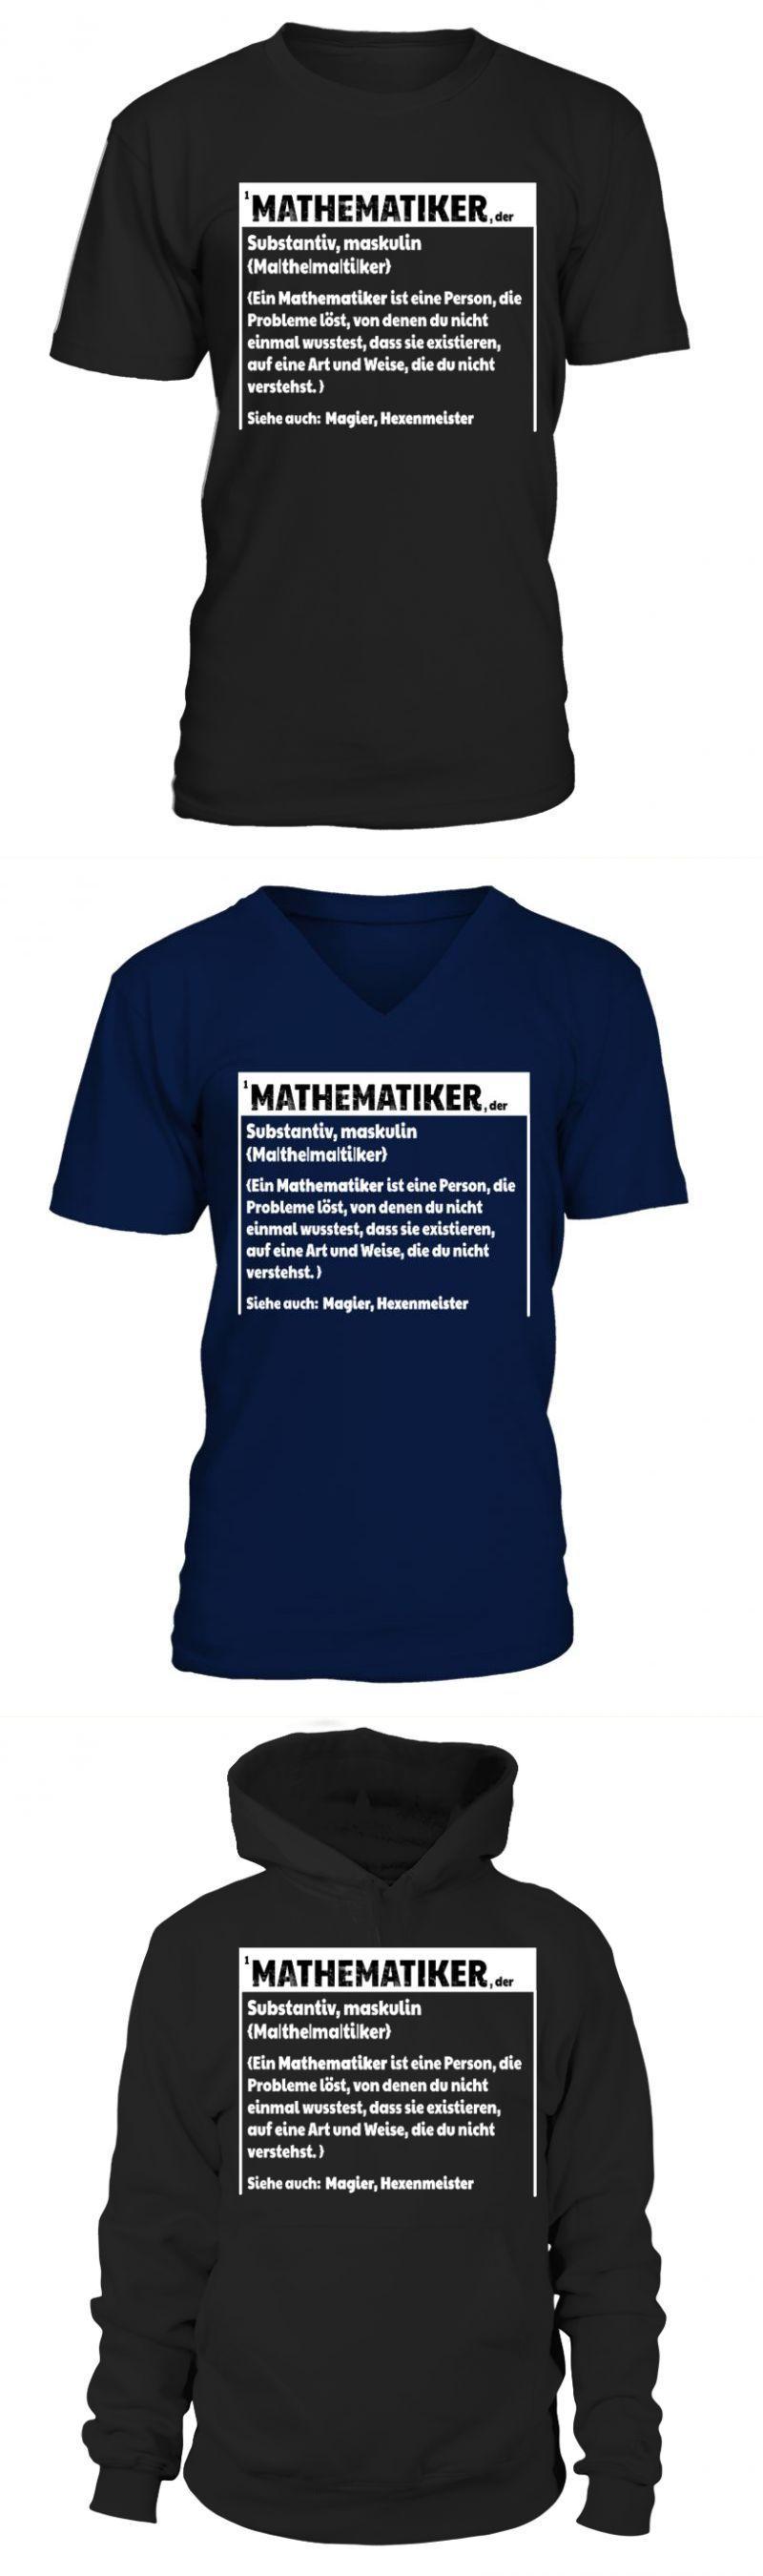 Stem education t shirts mathematiker definition special